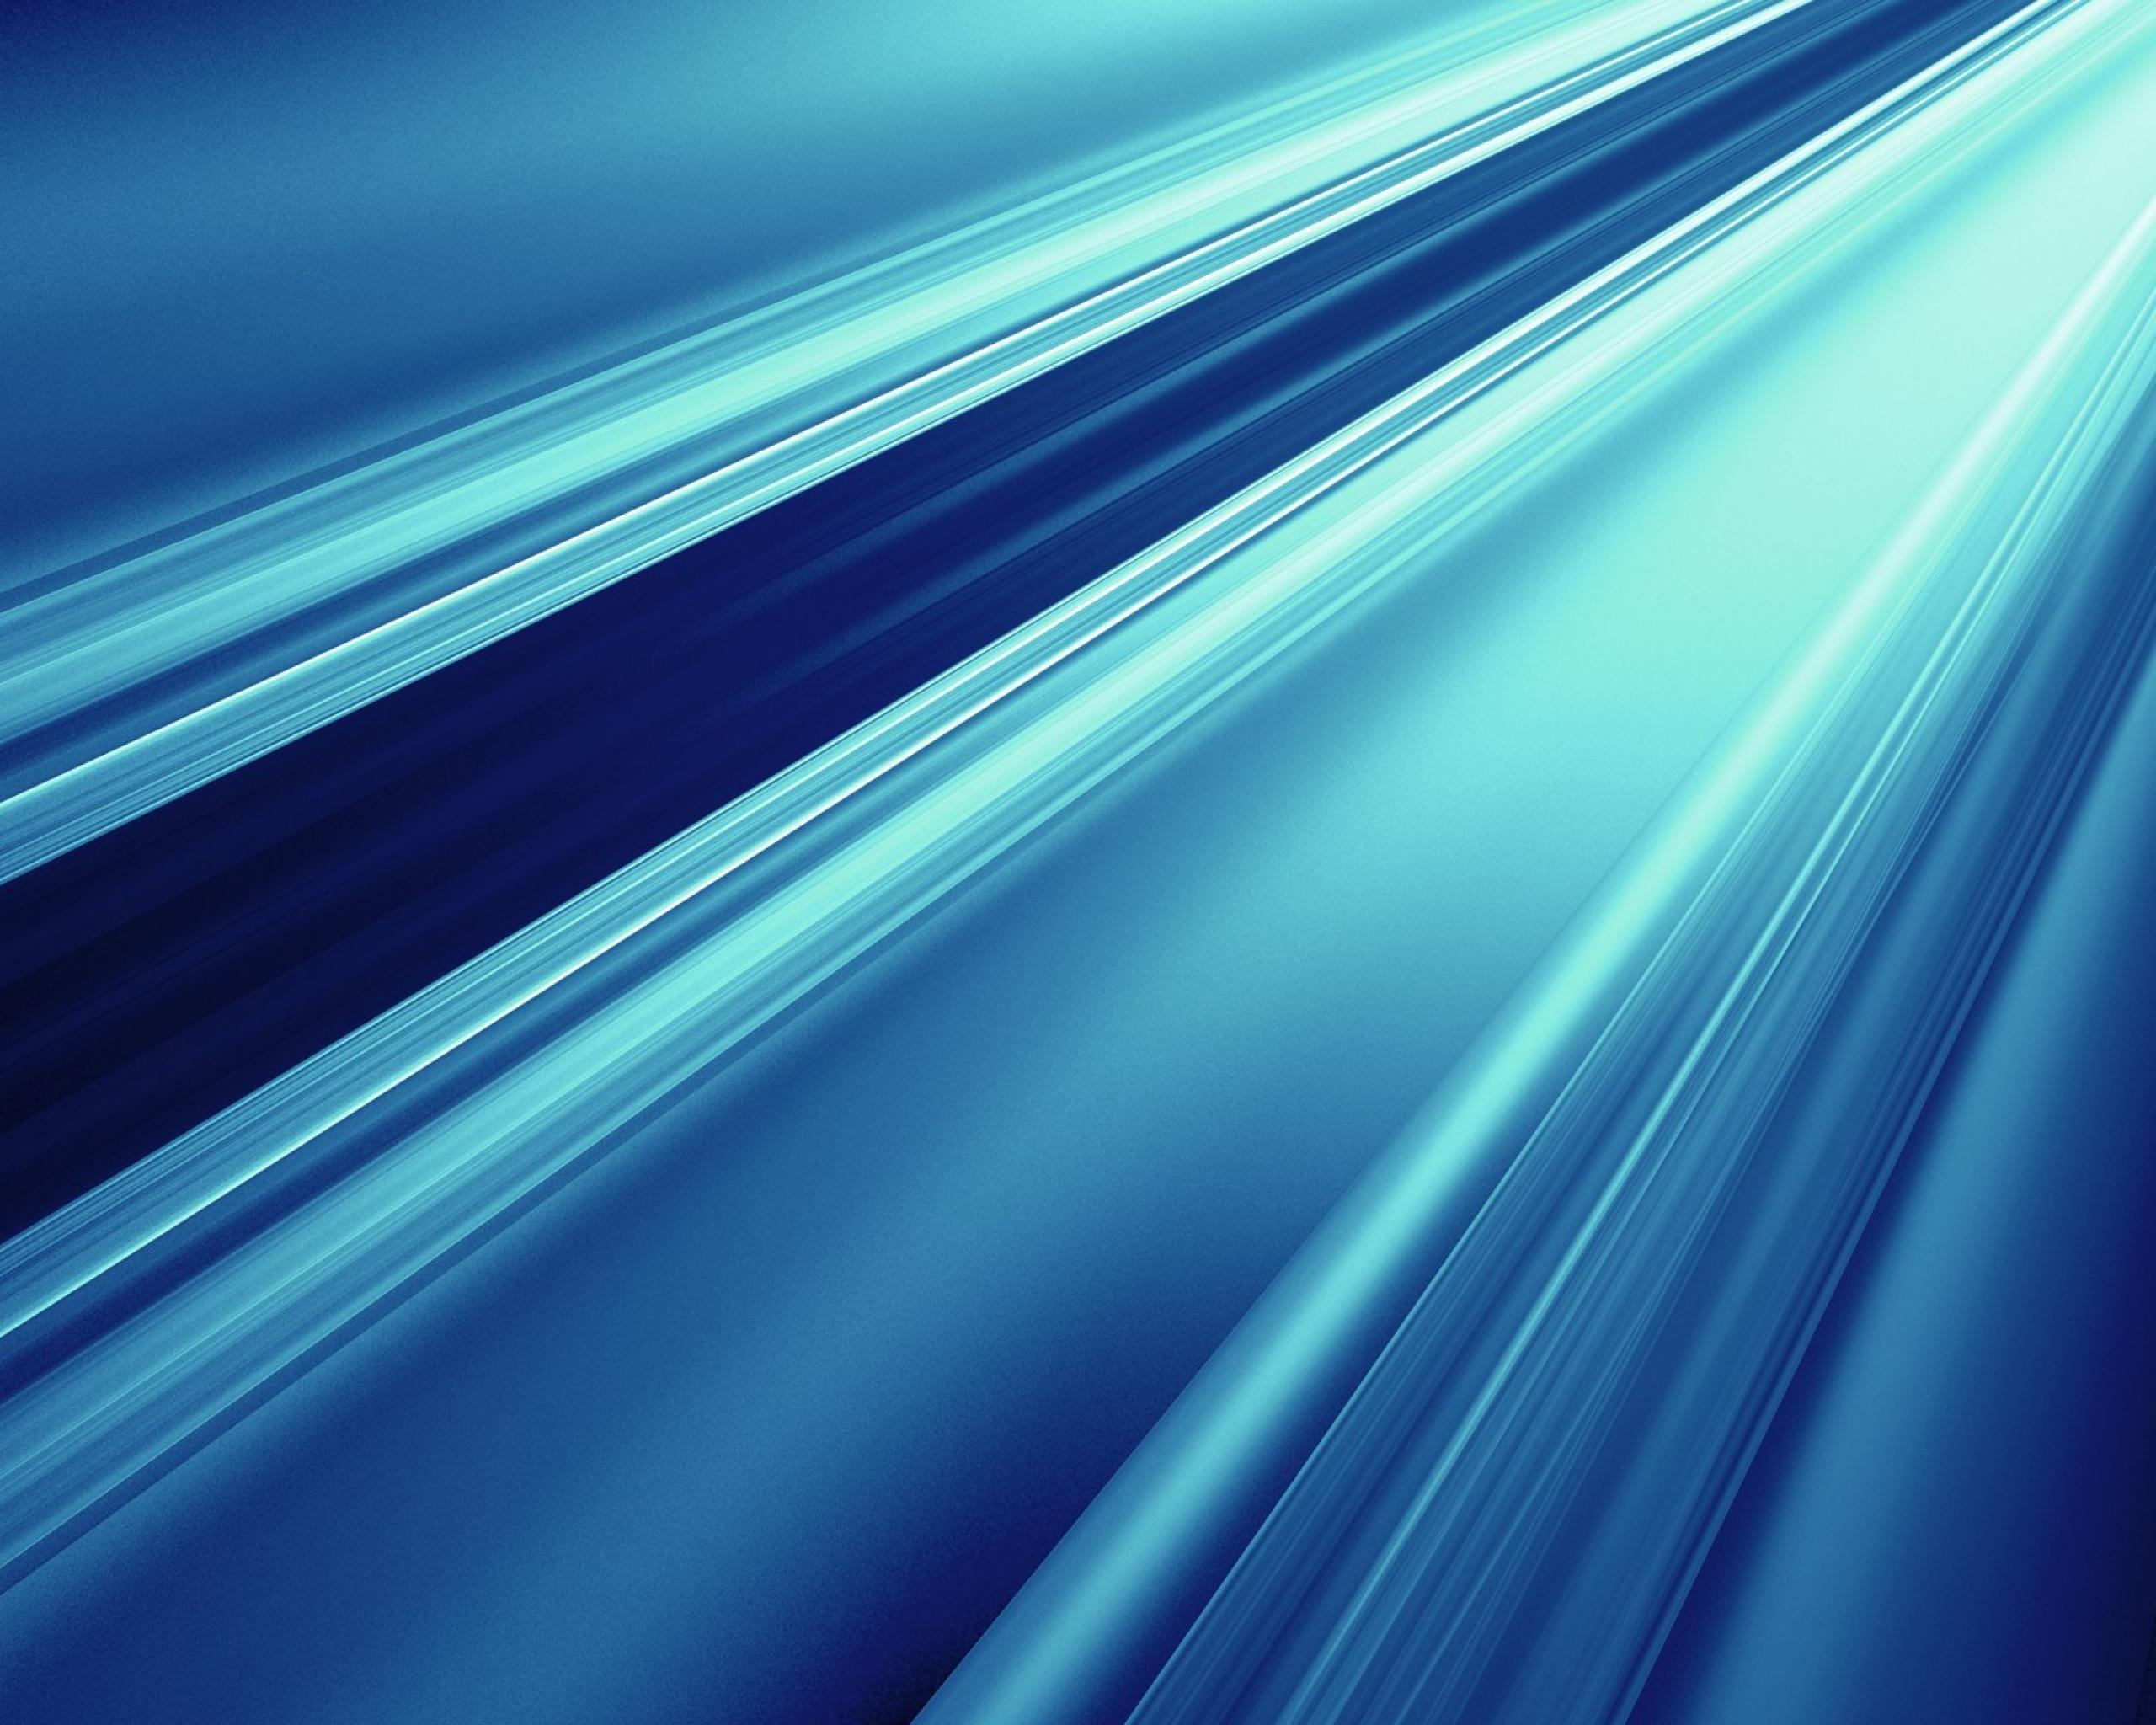 Wallpapers Abstract Light Blue Up Net Download #12390 Wallpaper .